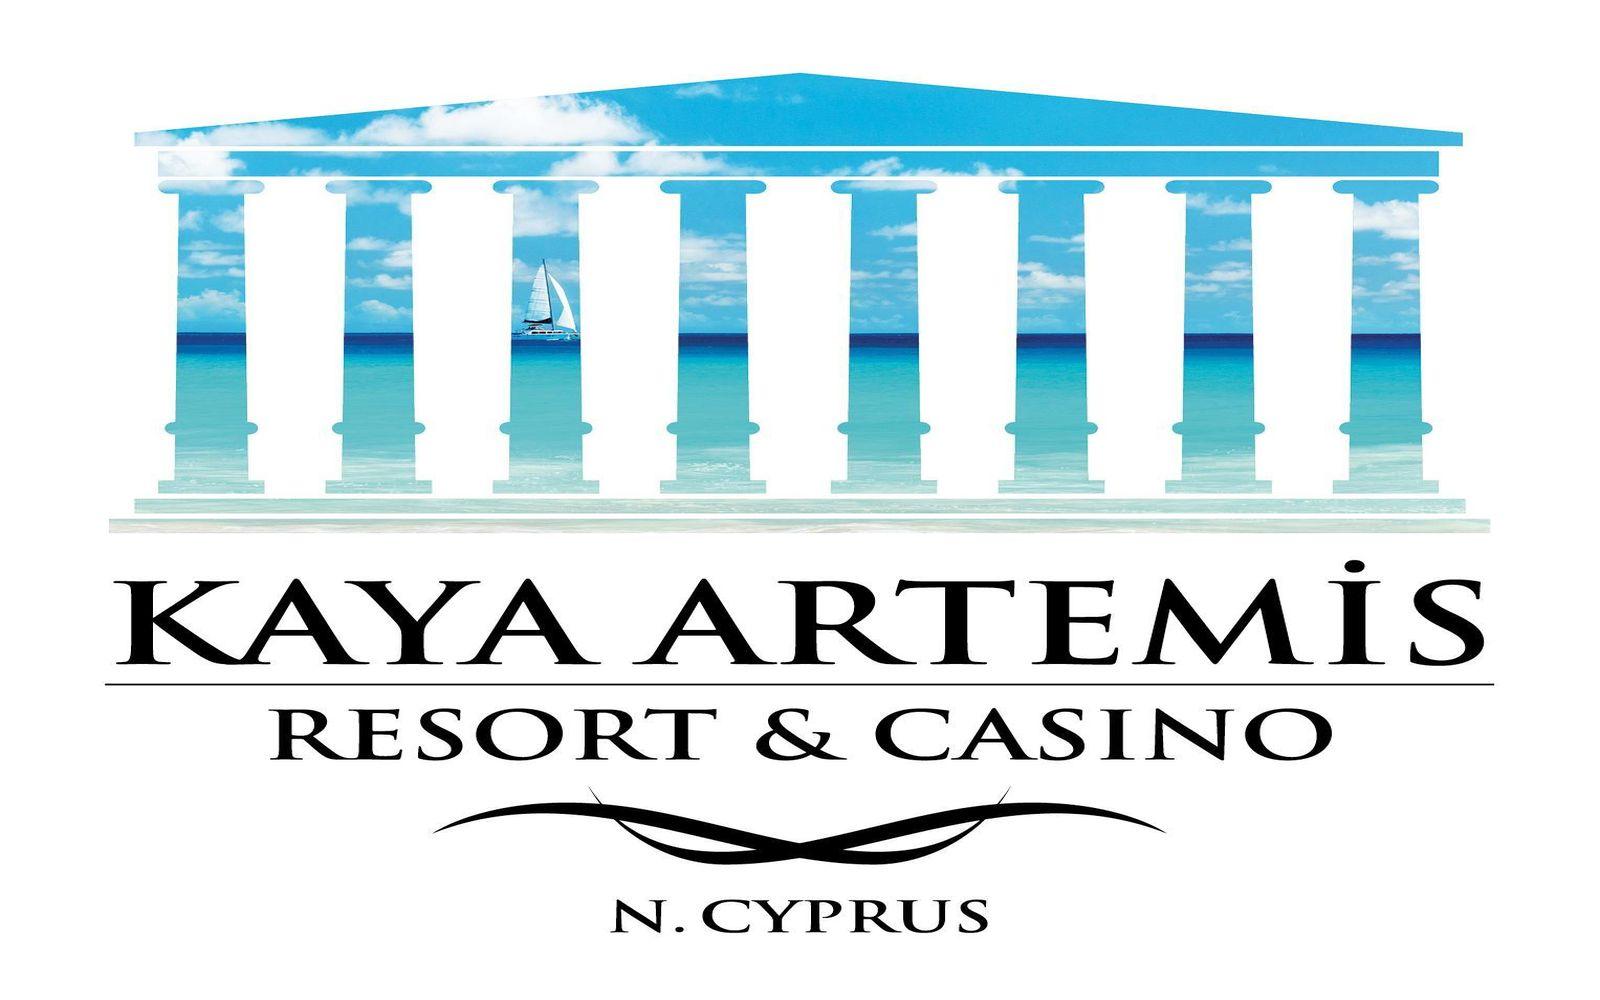 Kaya Artemis